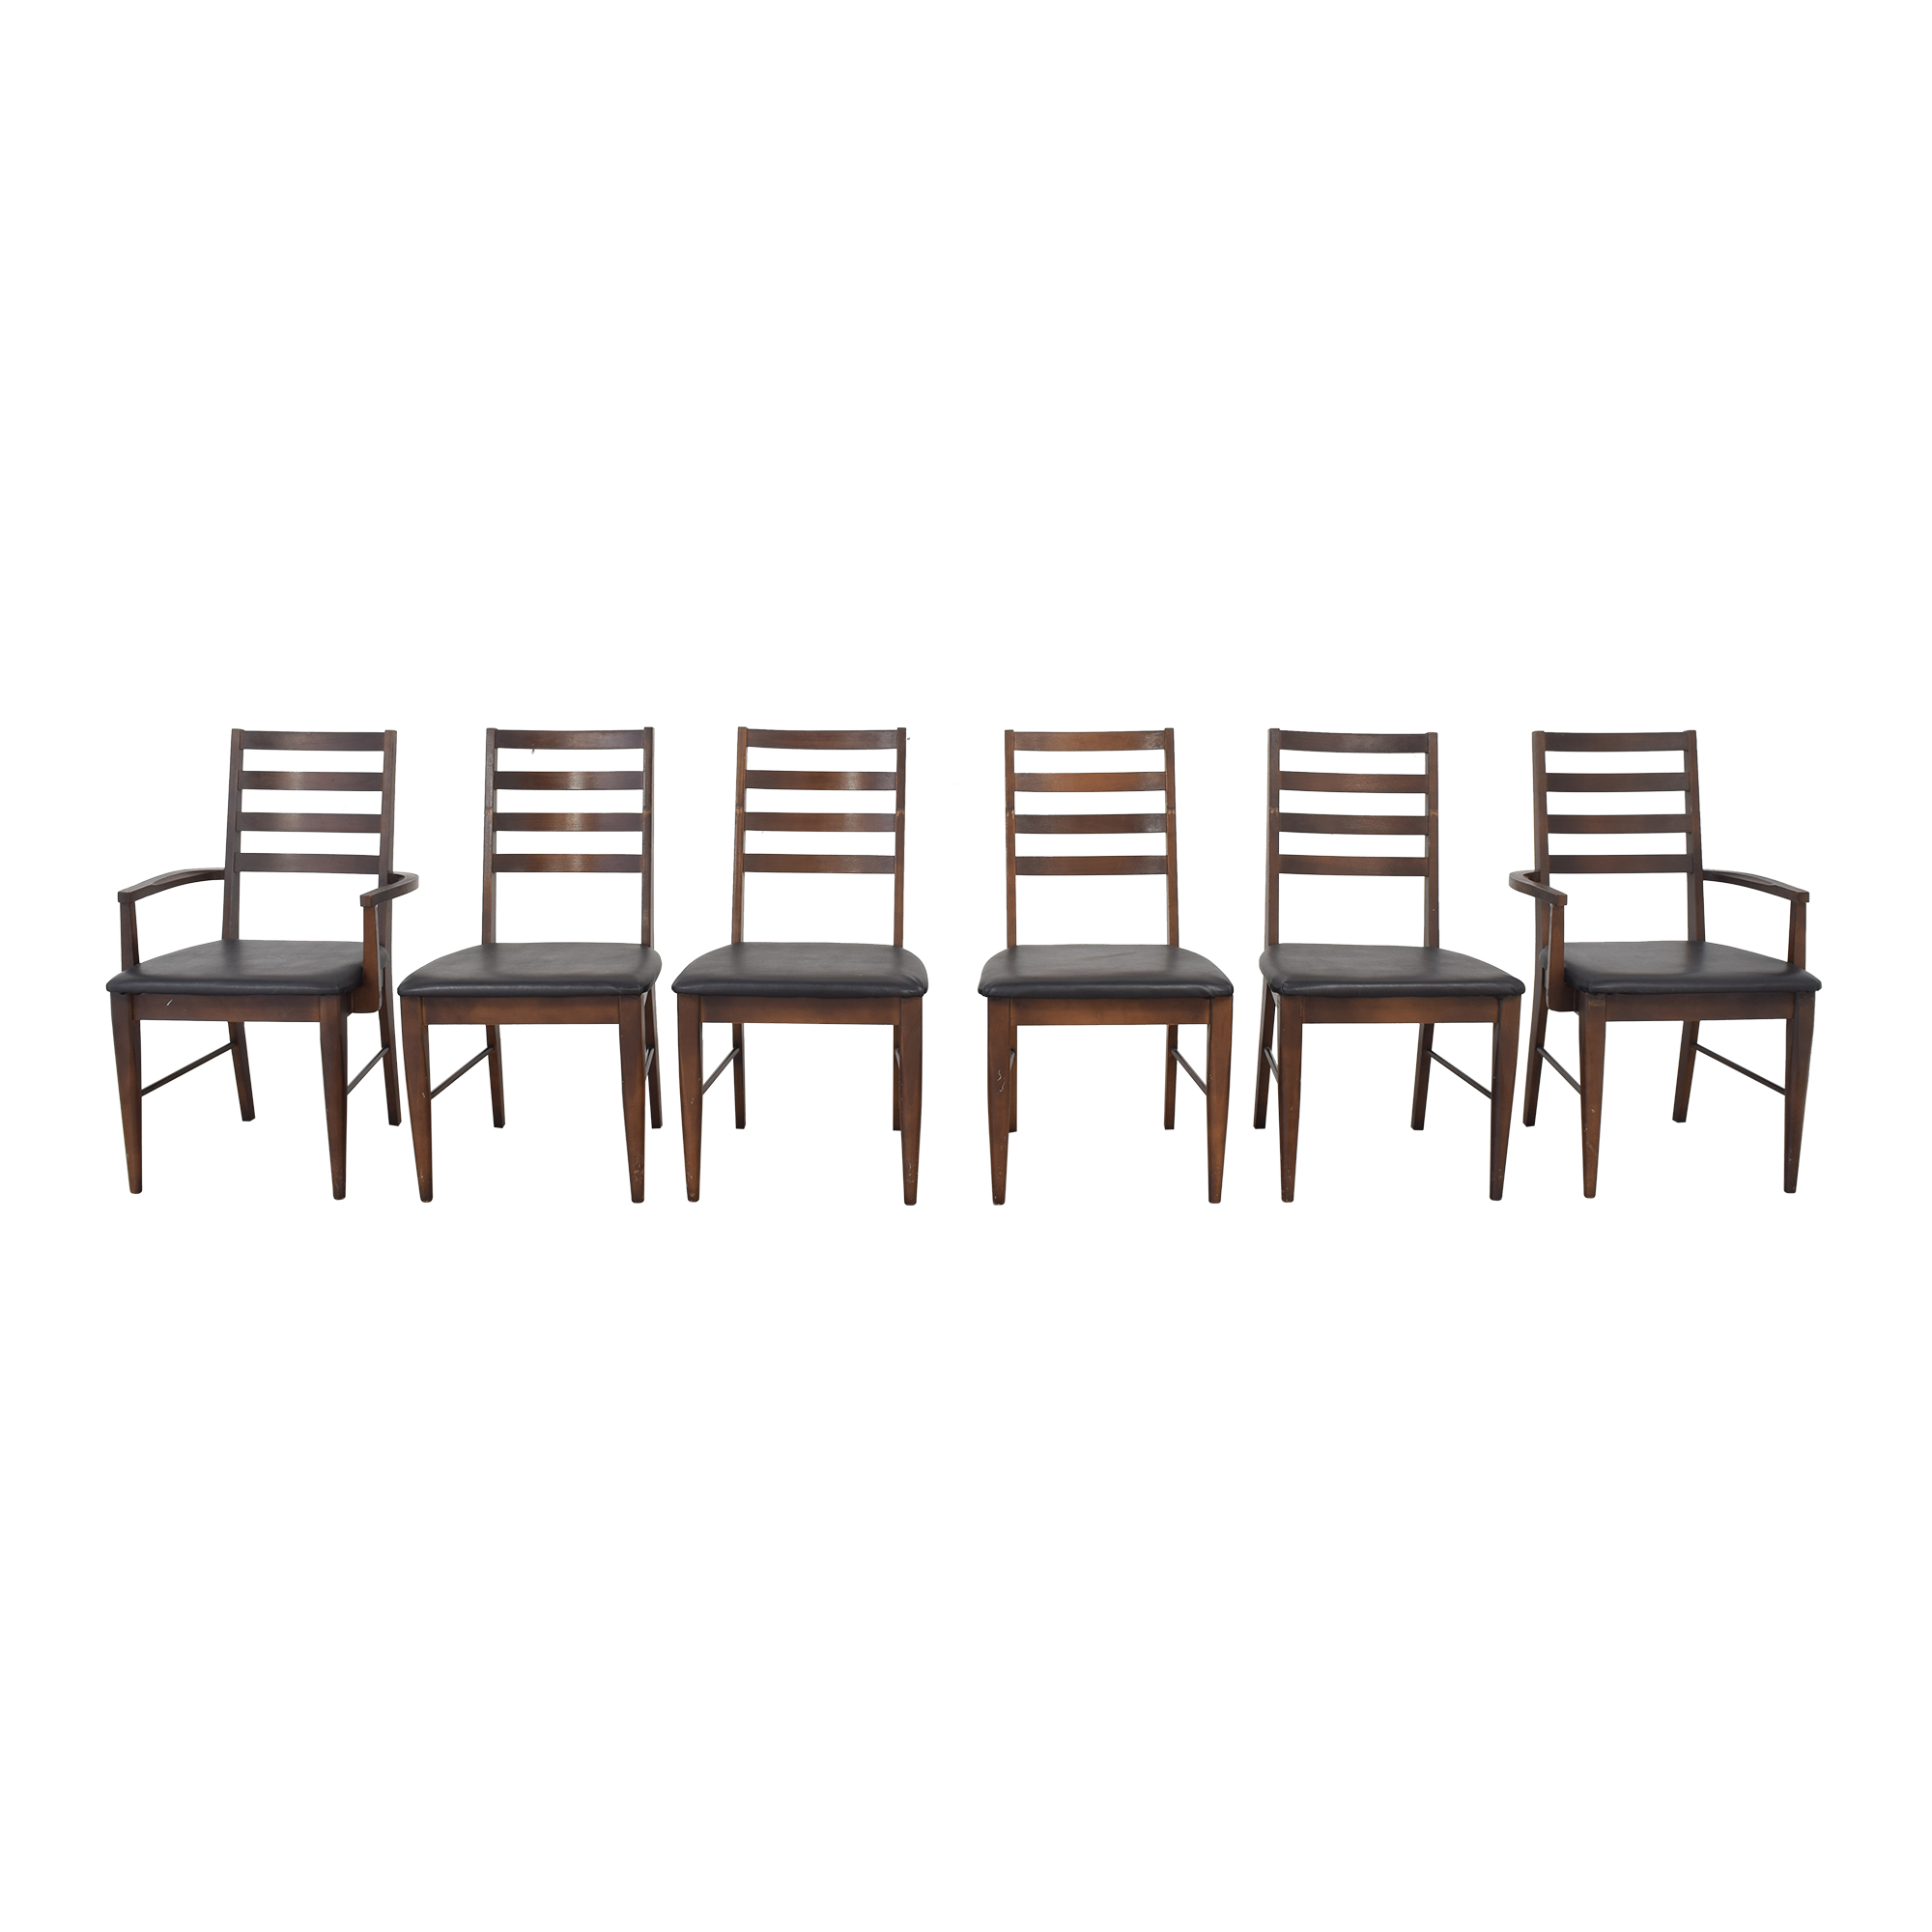 Lenoir Chair Company Lenoir Dining Chairs Chairs